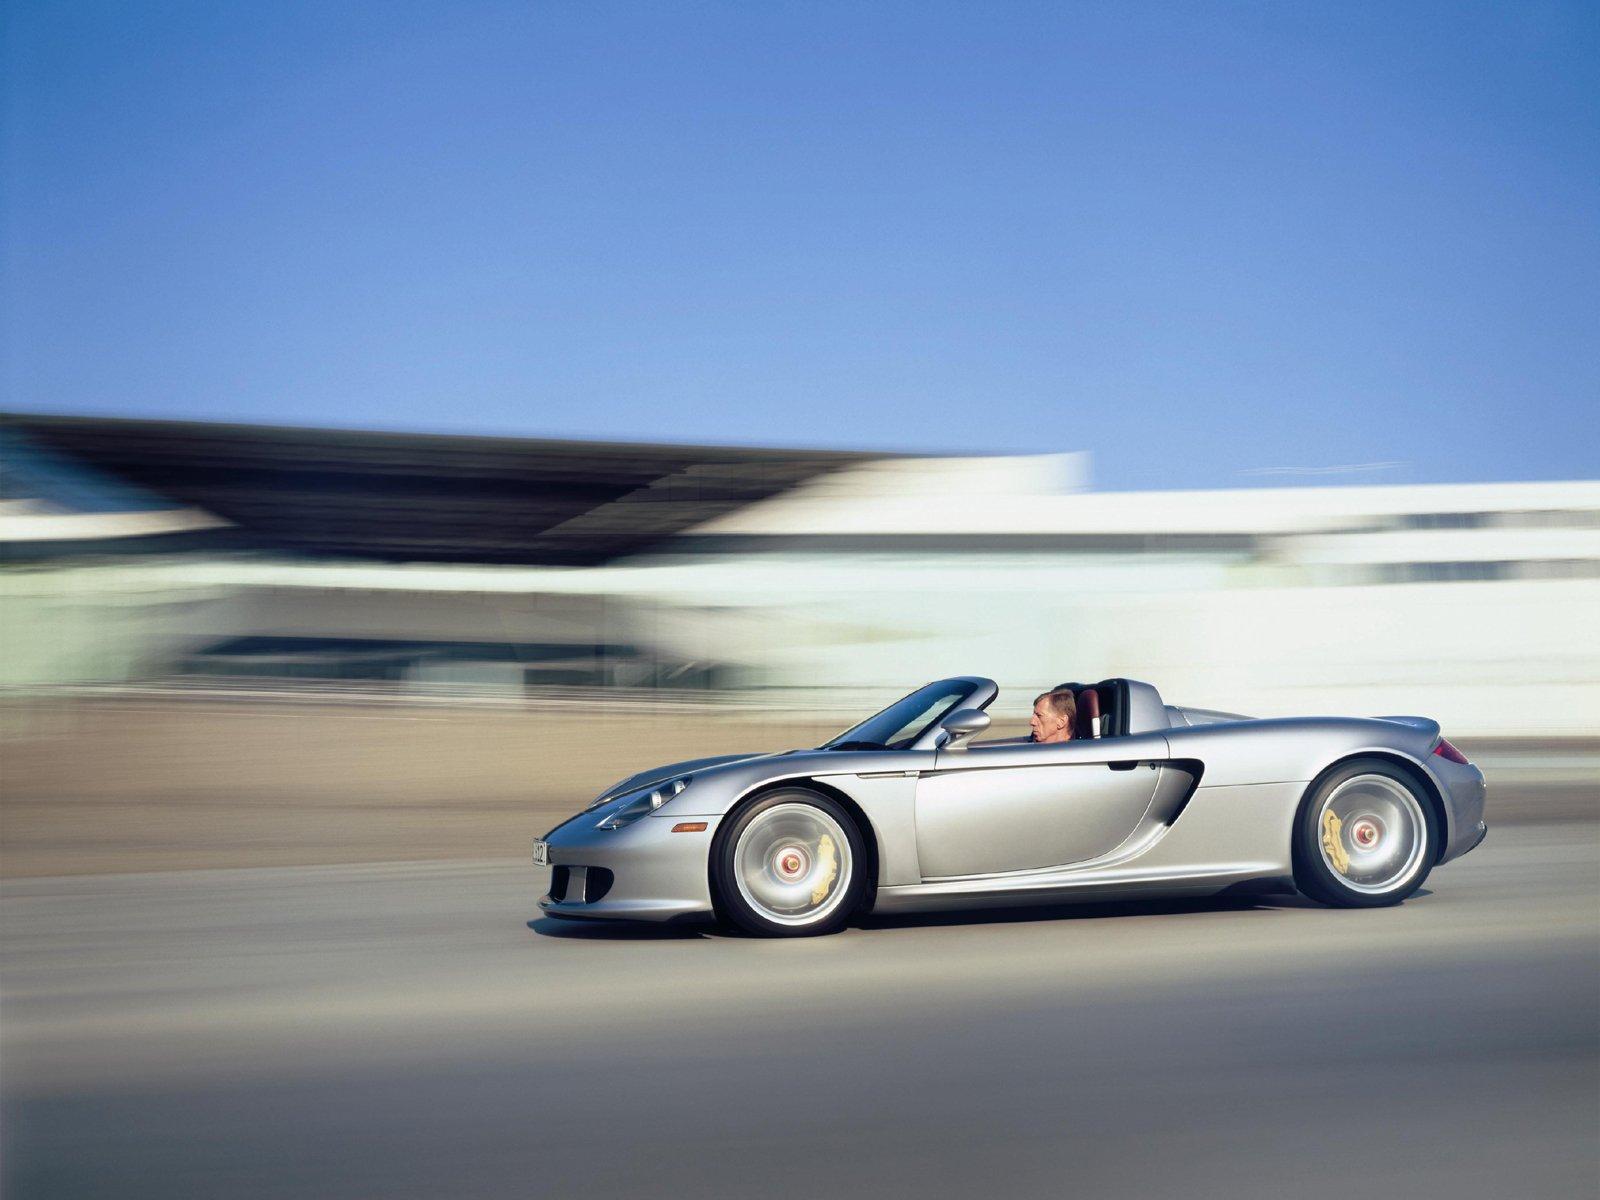 http://3.bp.blogspot.com/-PqzL_sa2i6o/Te0JUvq1gpI/AAAAAAAAAXo/w1IIrE-7cz0/s1600/Porsche%2BCarrera%2BGT%2BWallpapers-6.jpg